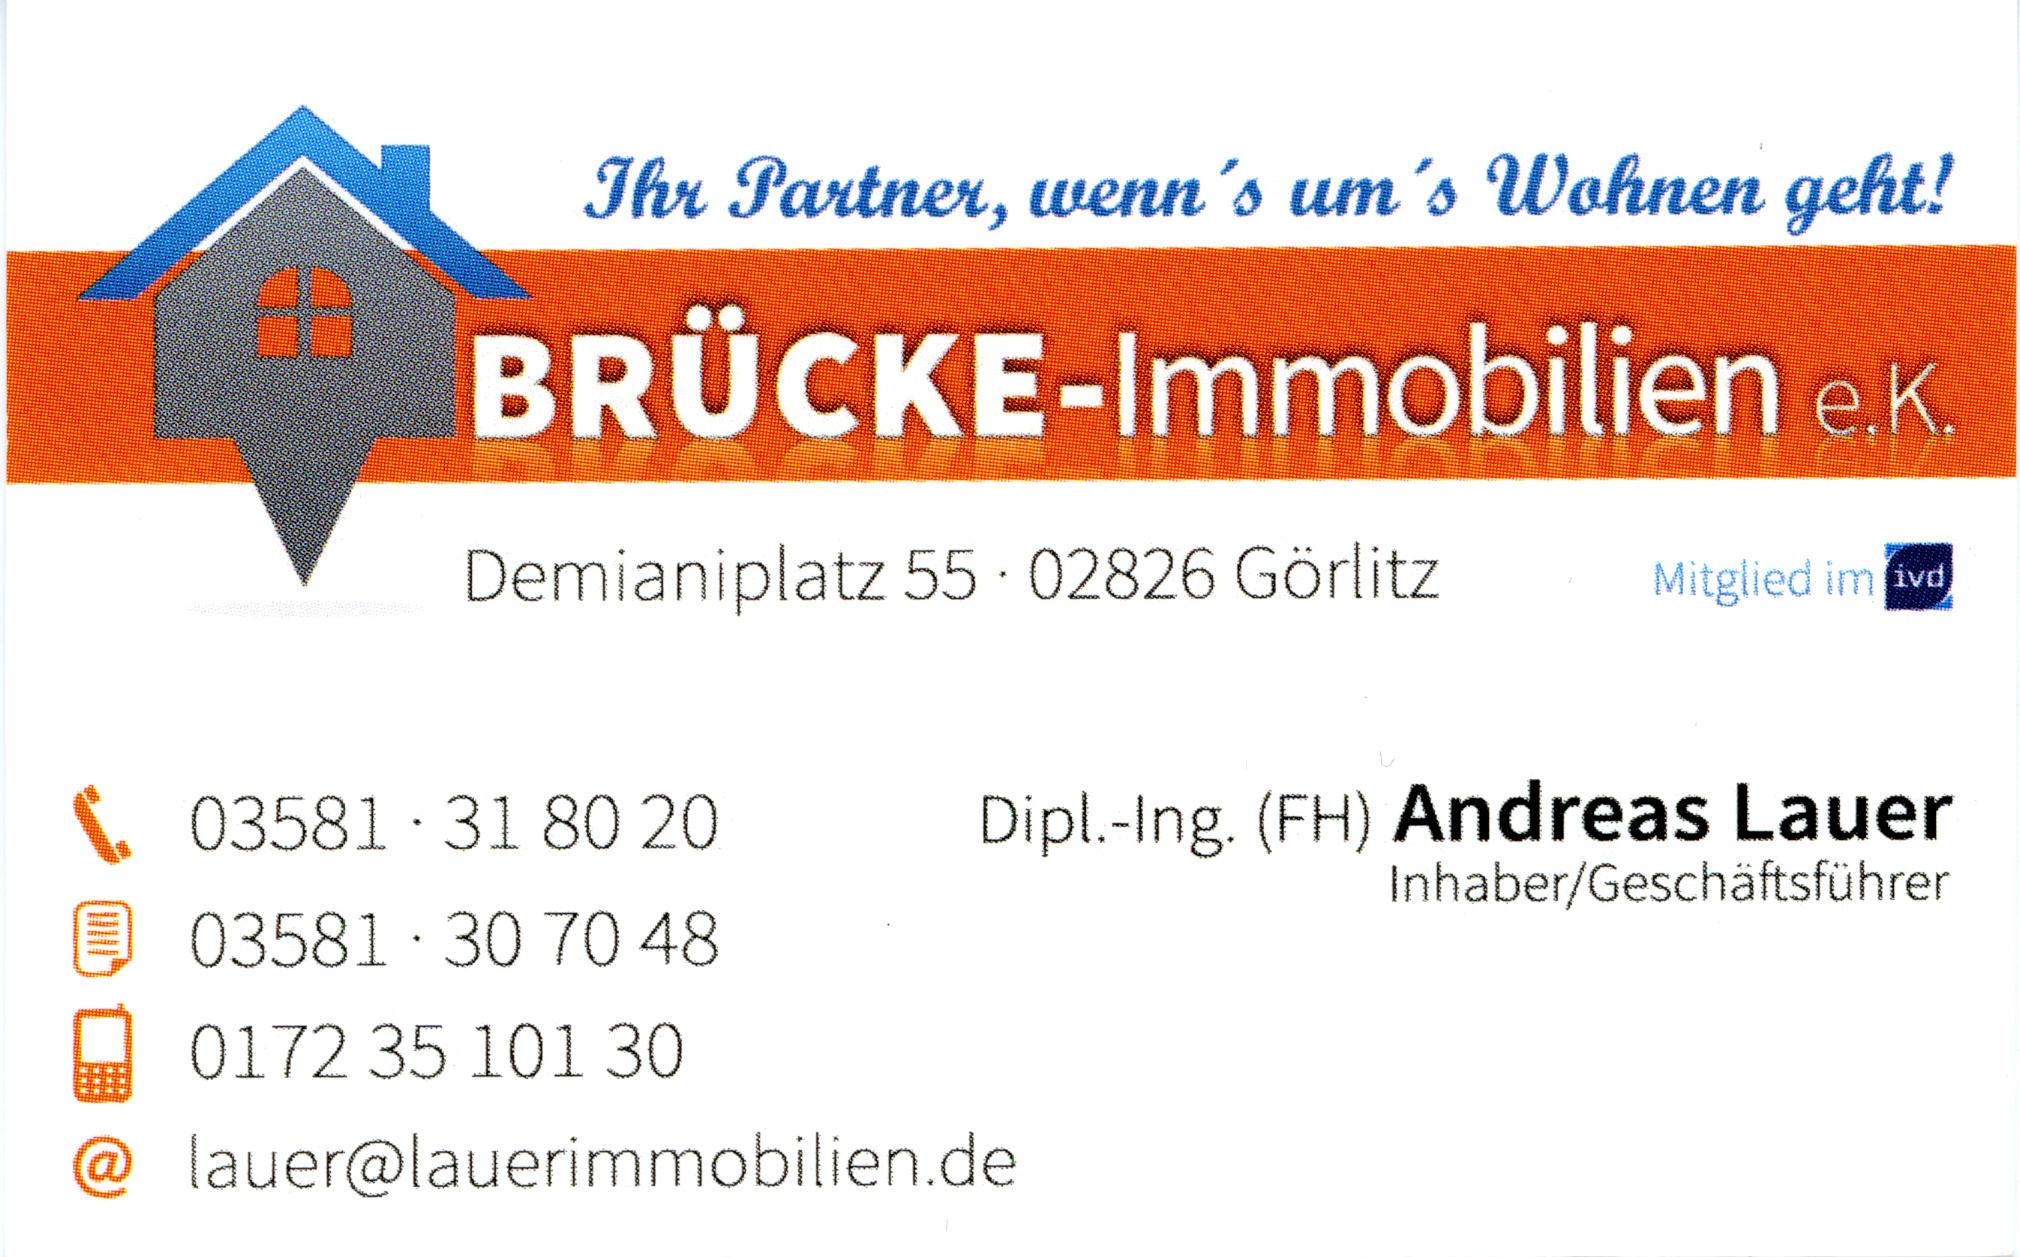 BRÜCKE - Immobilien e.K.